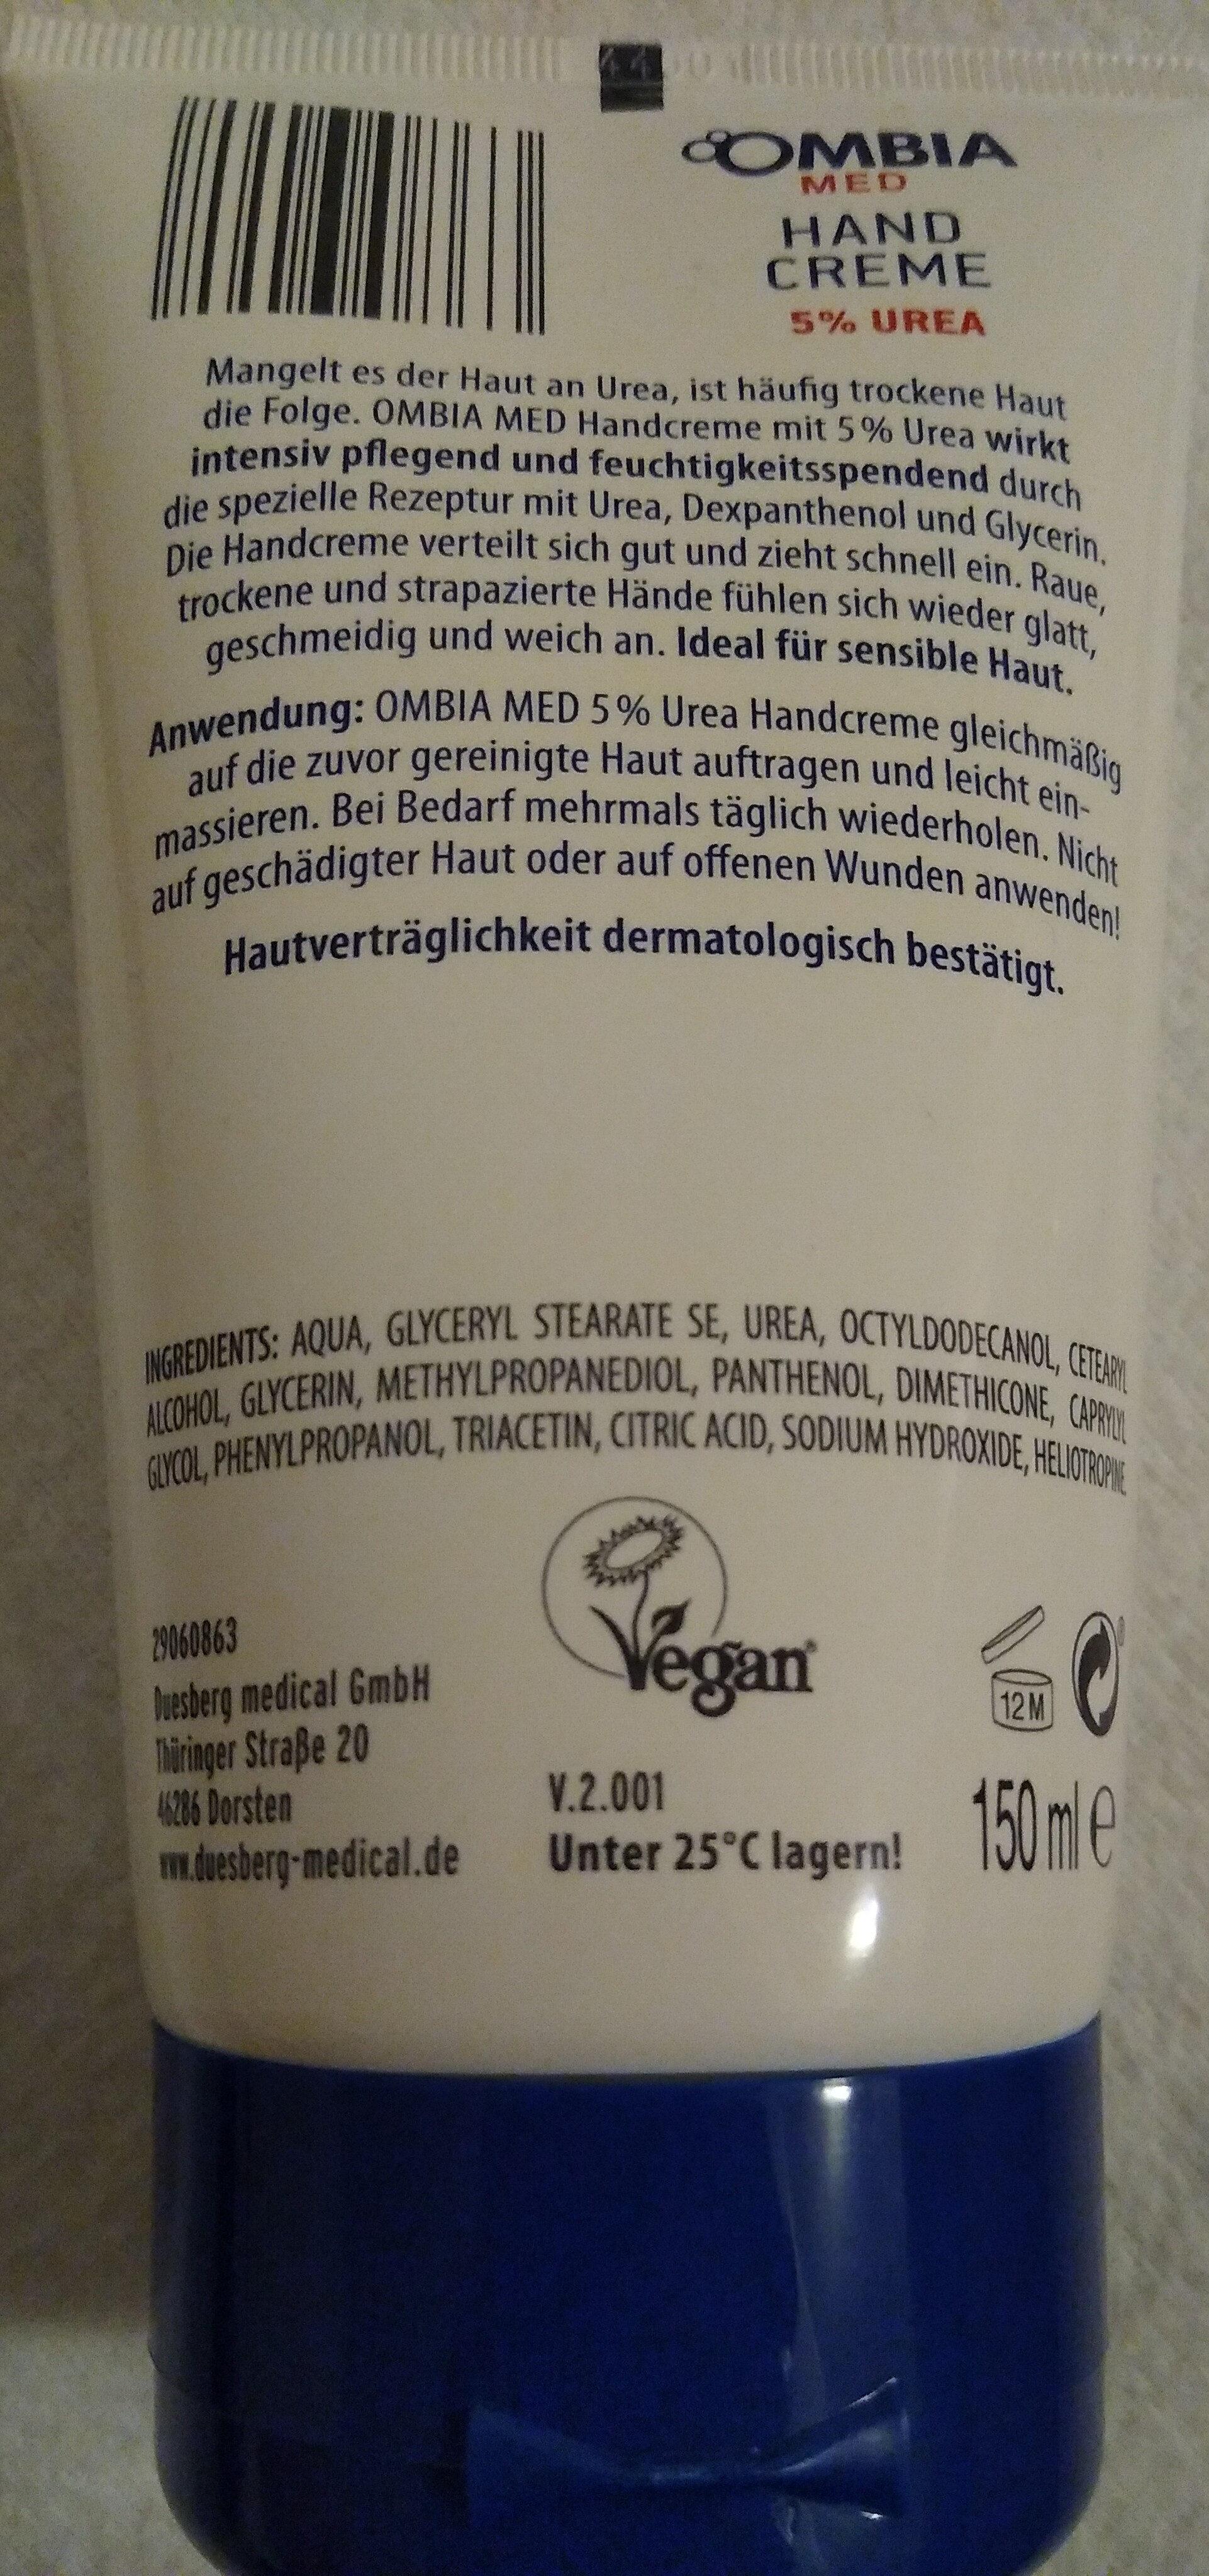 Ombia Med Hand Creme 5% Urea - Product - en